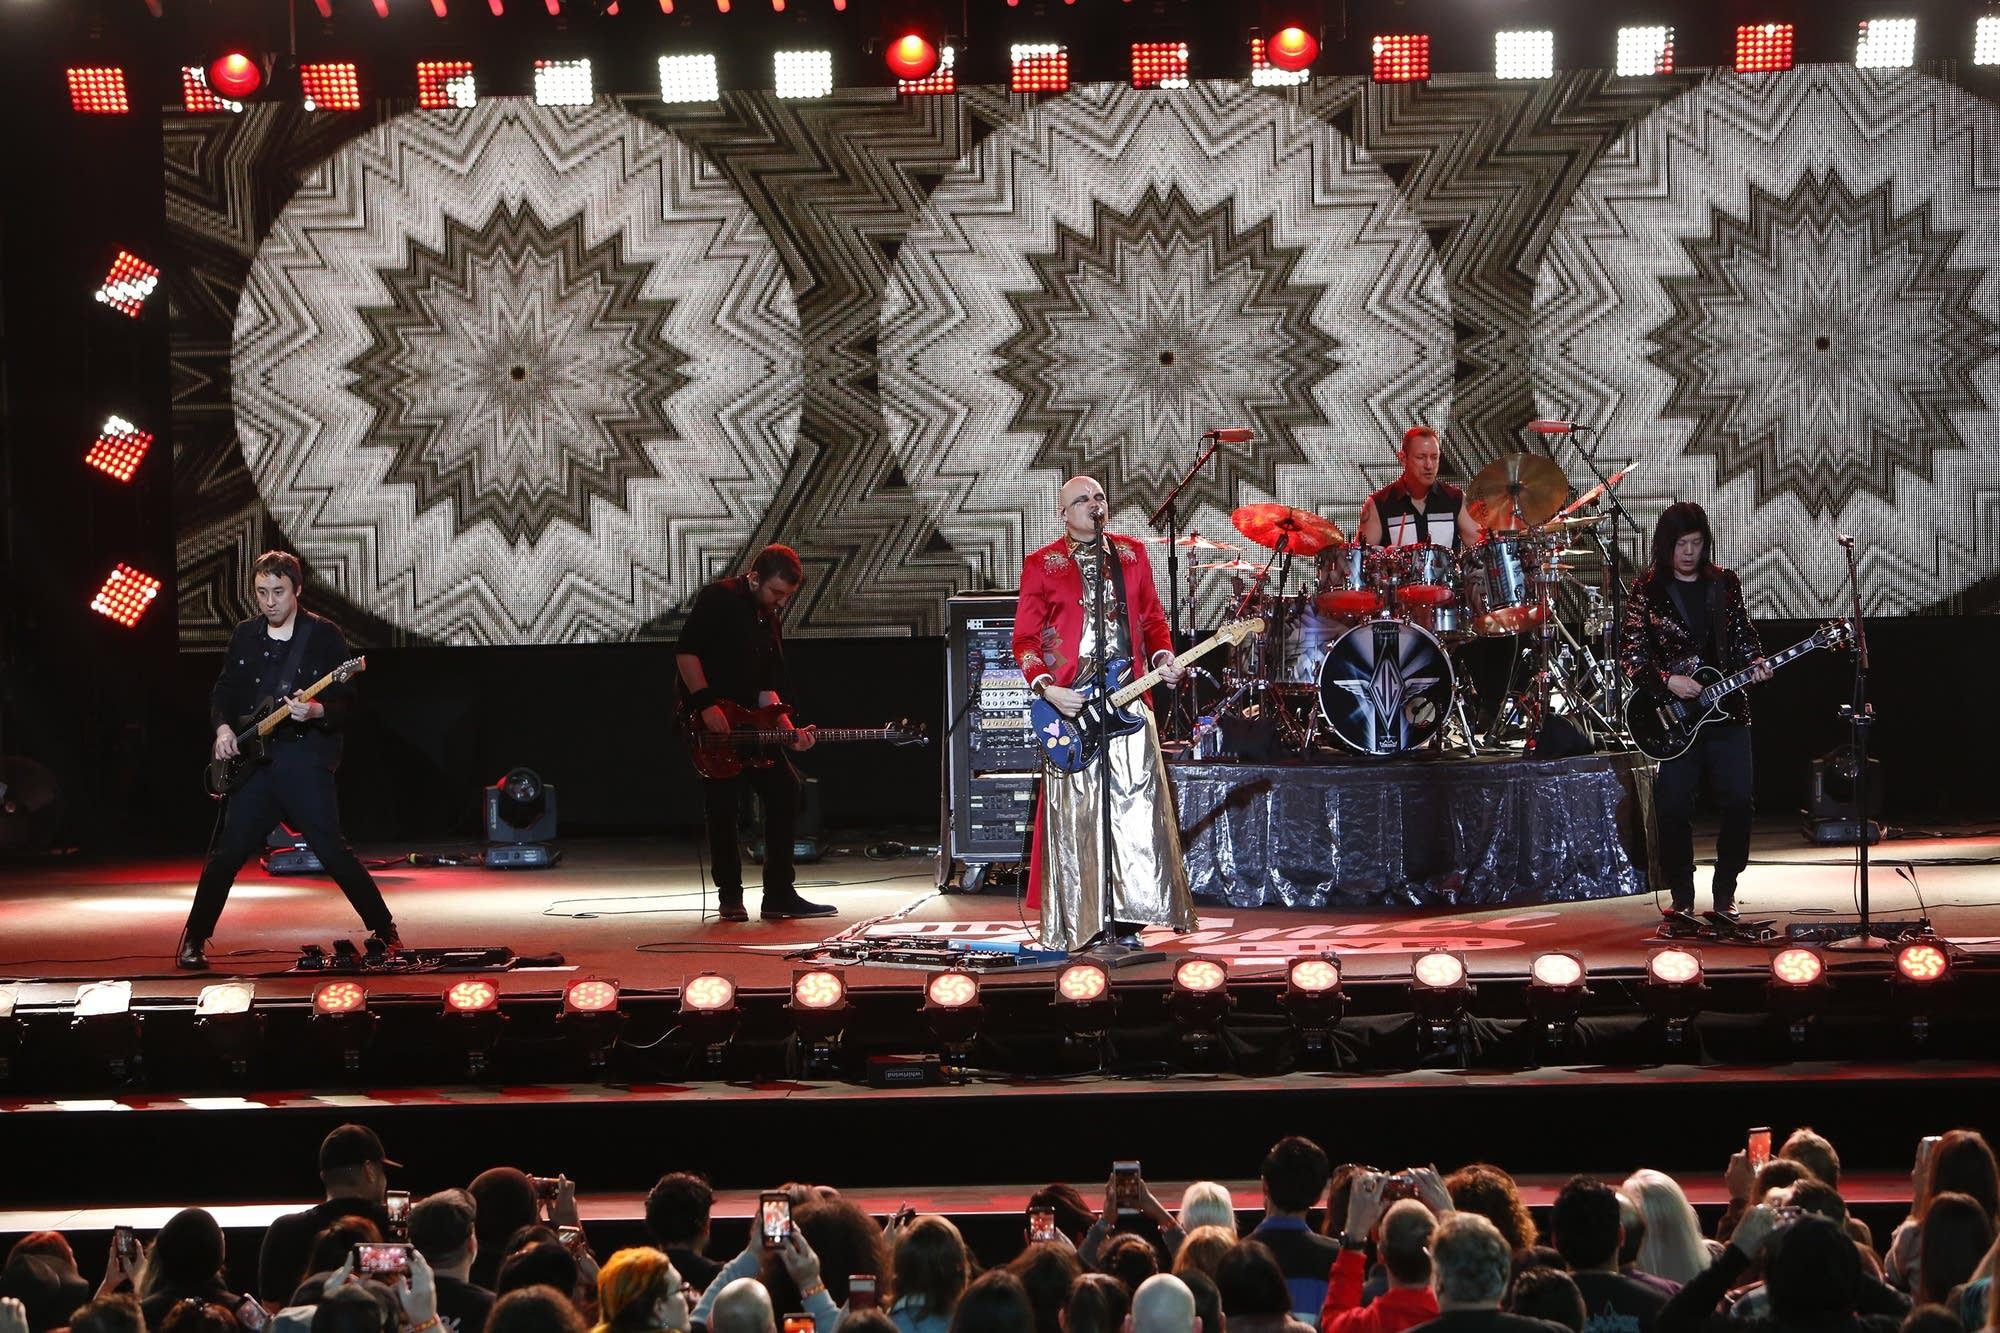 The Smashing Pumpkins perform on 'Jimmy Kimmel Live'